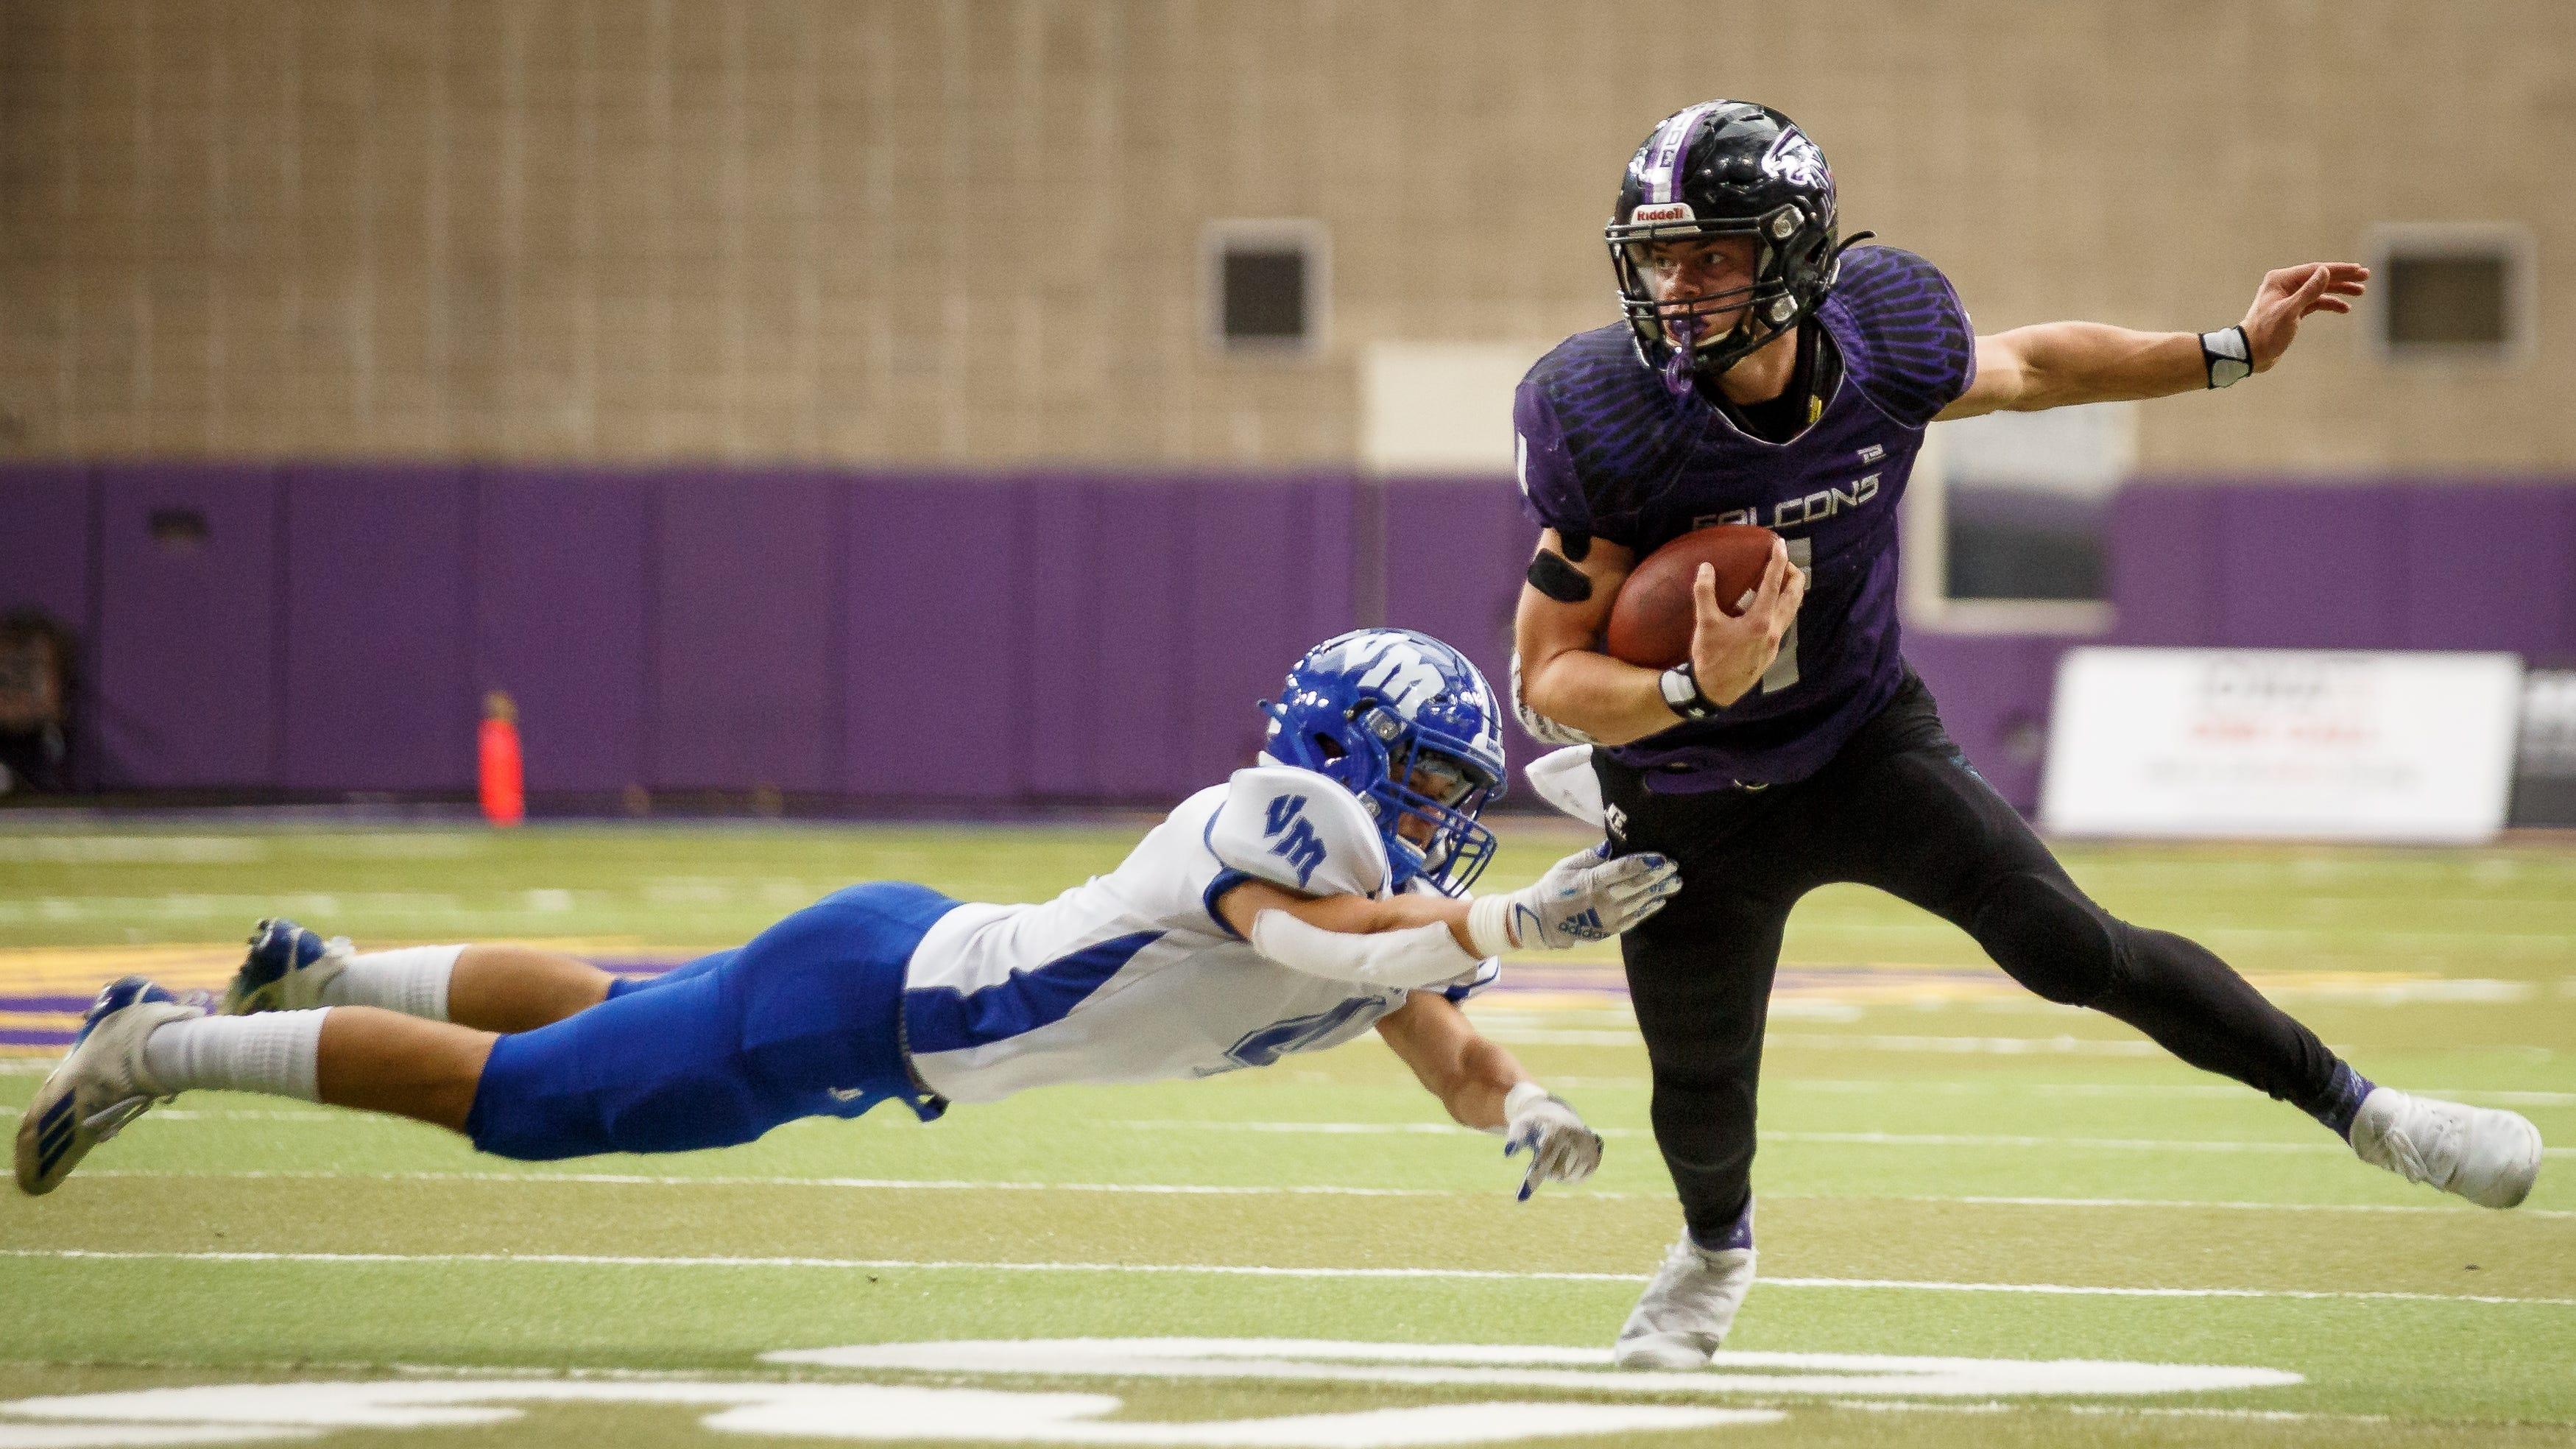 OABCIG's Cooper DeJean named Iowa High School Male Athlete of the Year